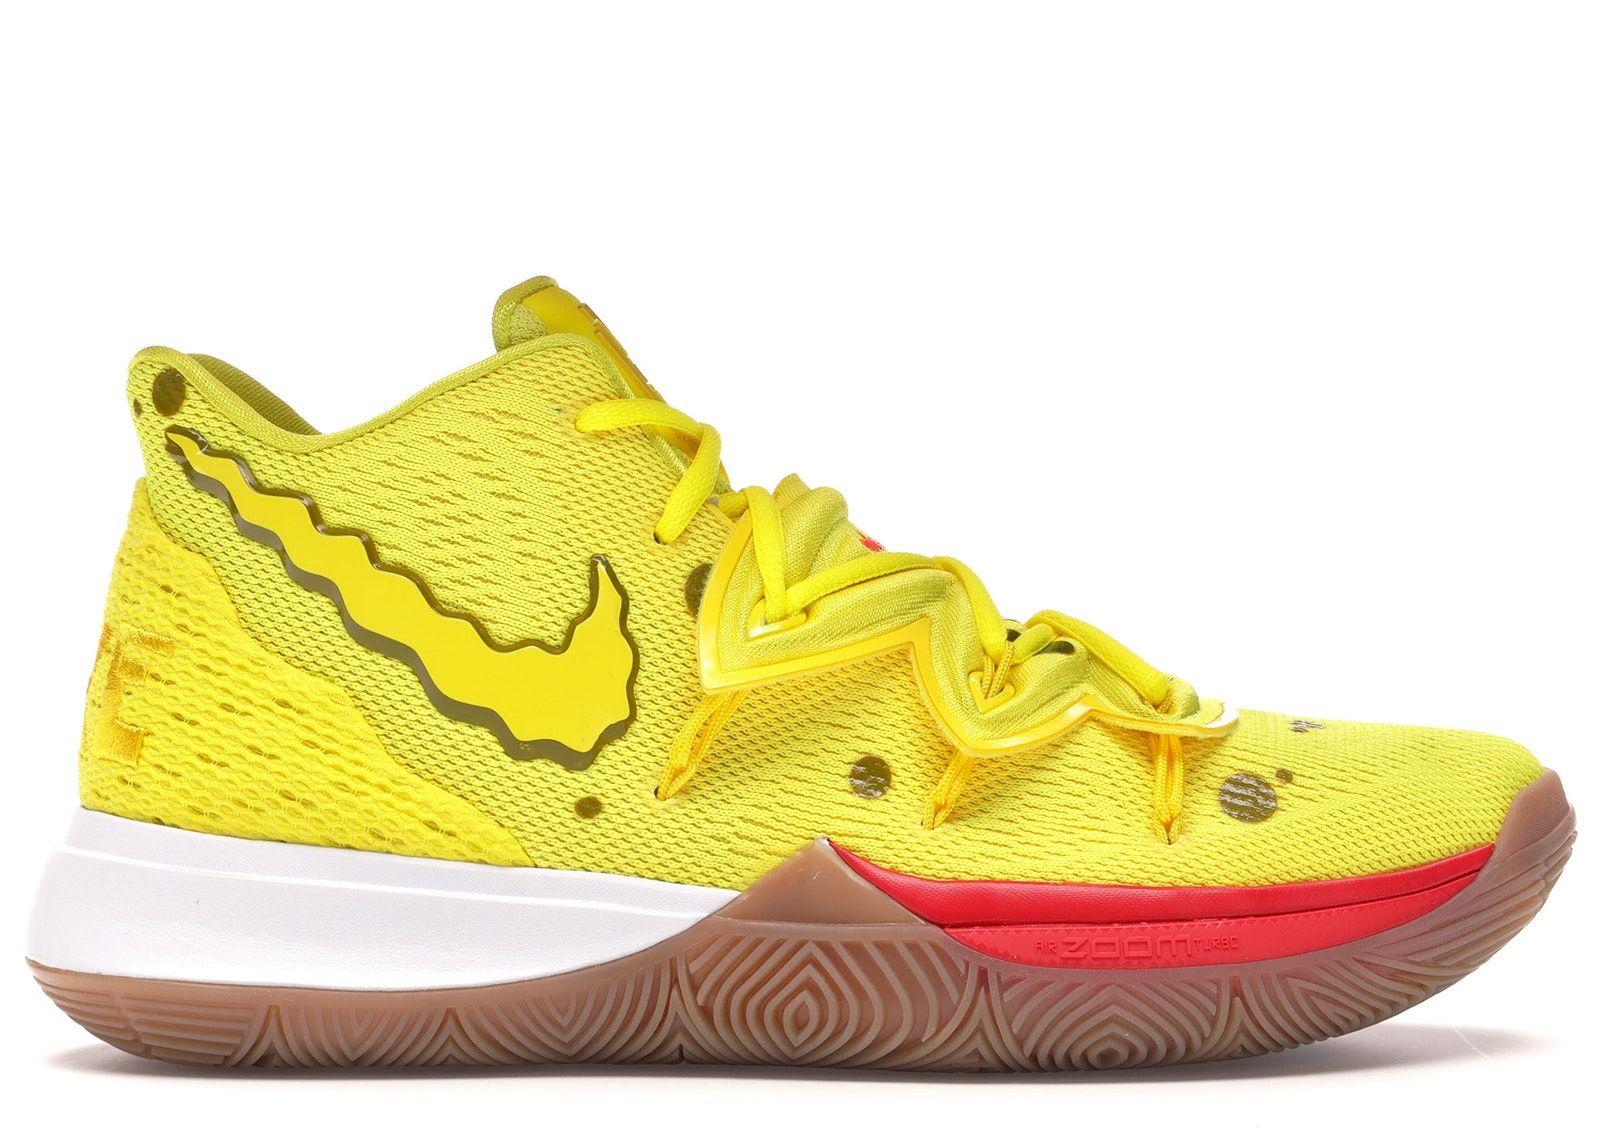 Nike Kyrie 5 Spongebob Squarepants   Nike kyrie, Nike, Kyrie ...